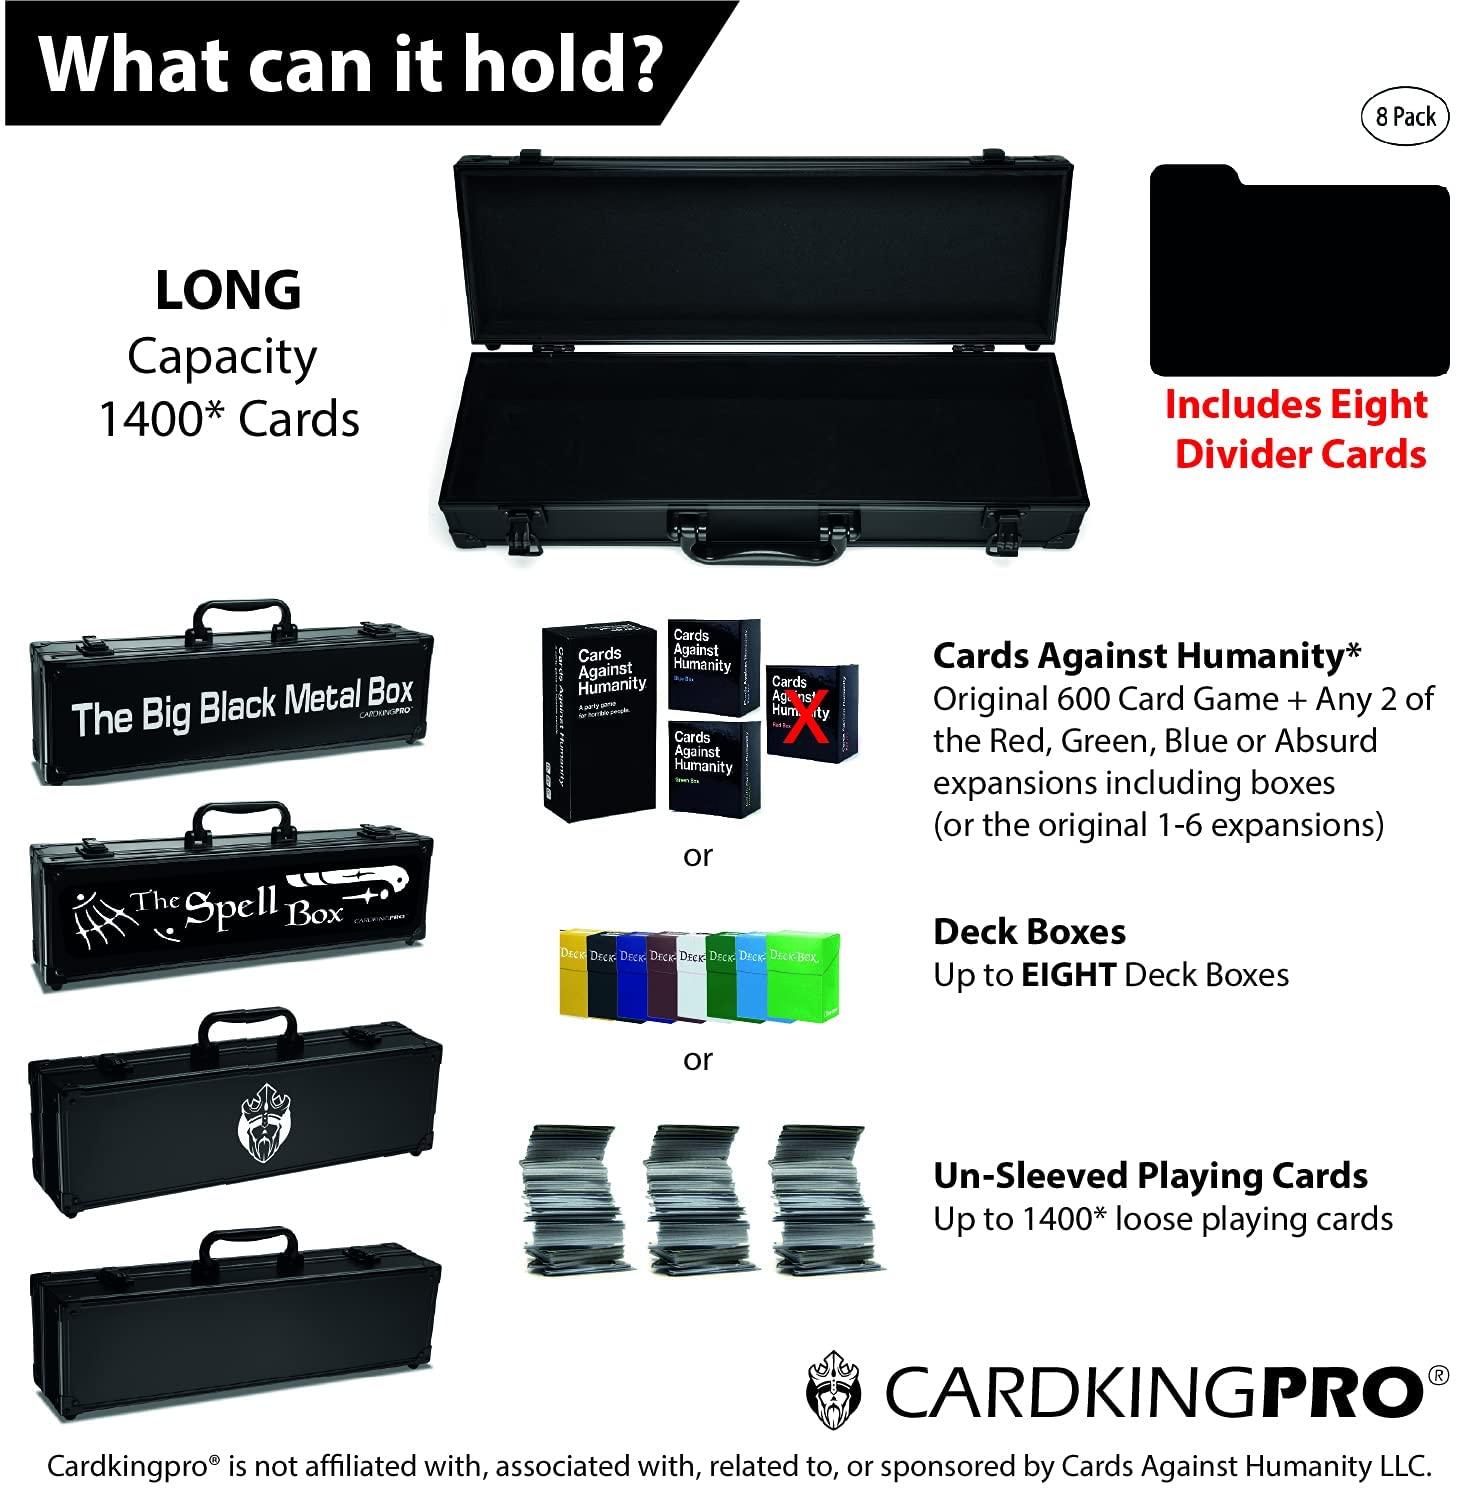 LONG Capacity 2400 Cards